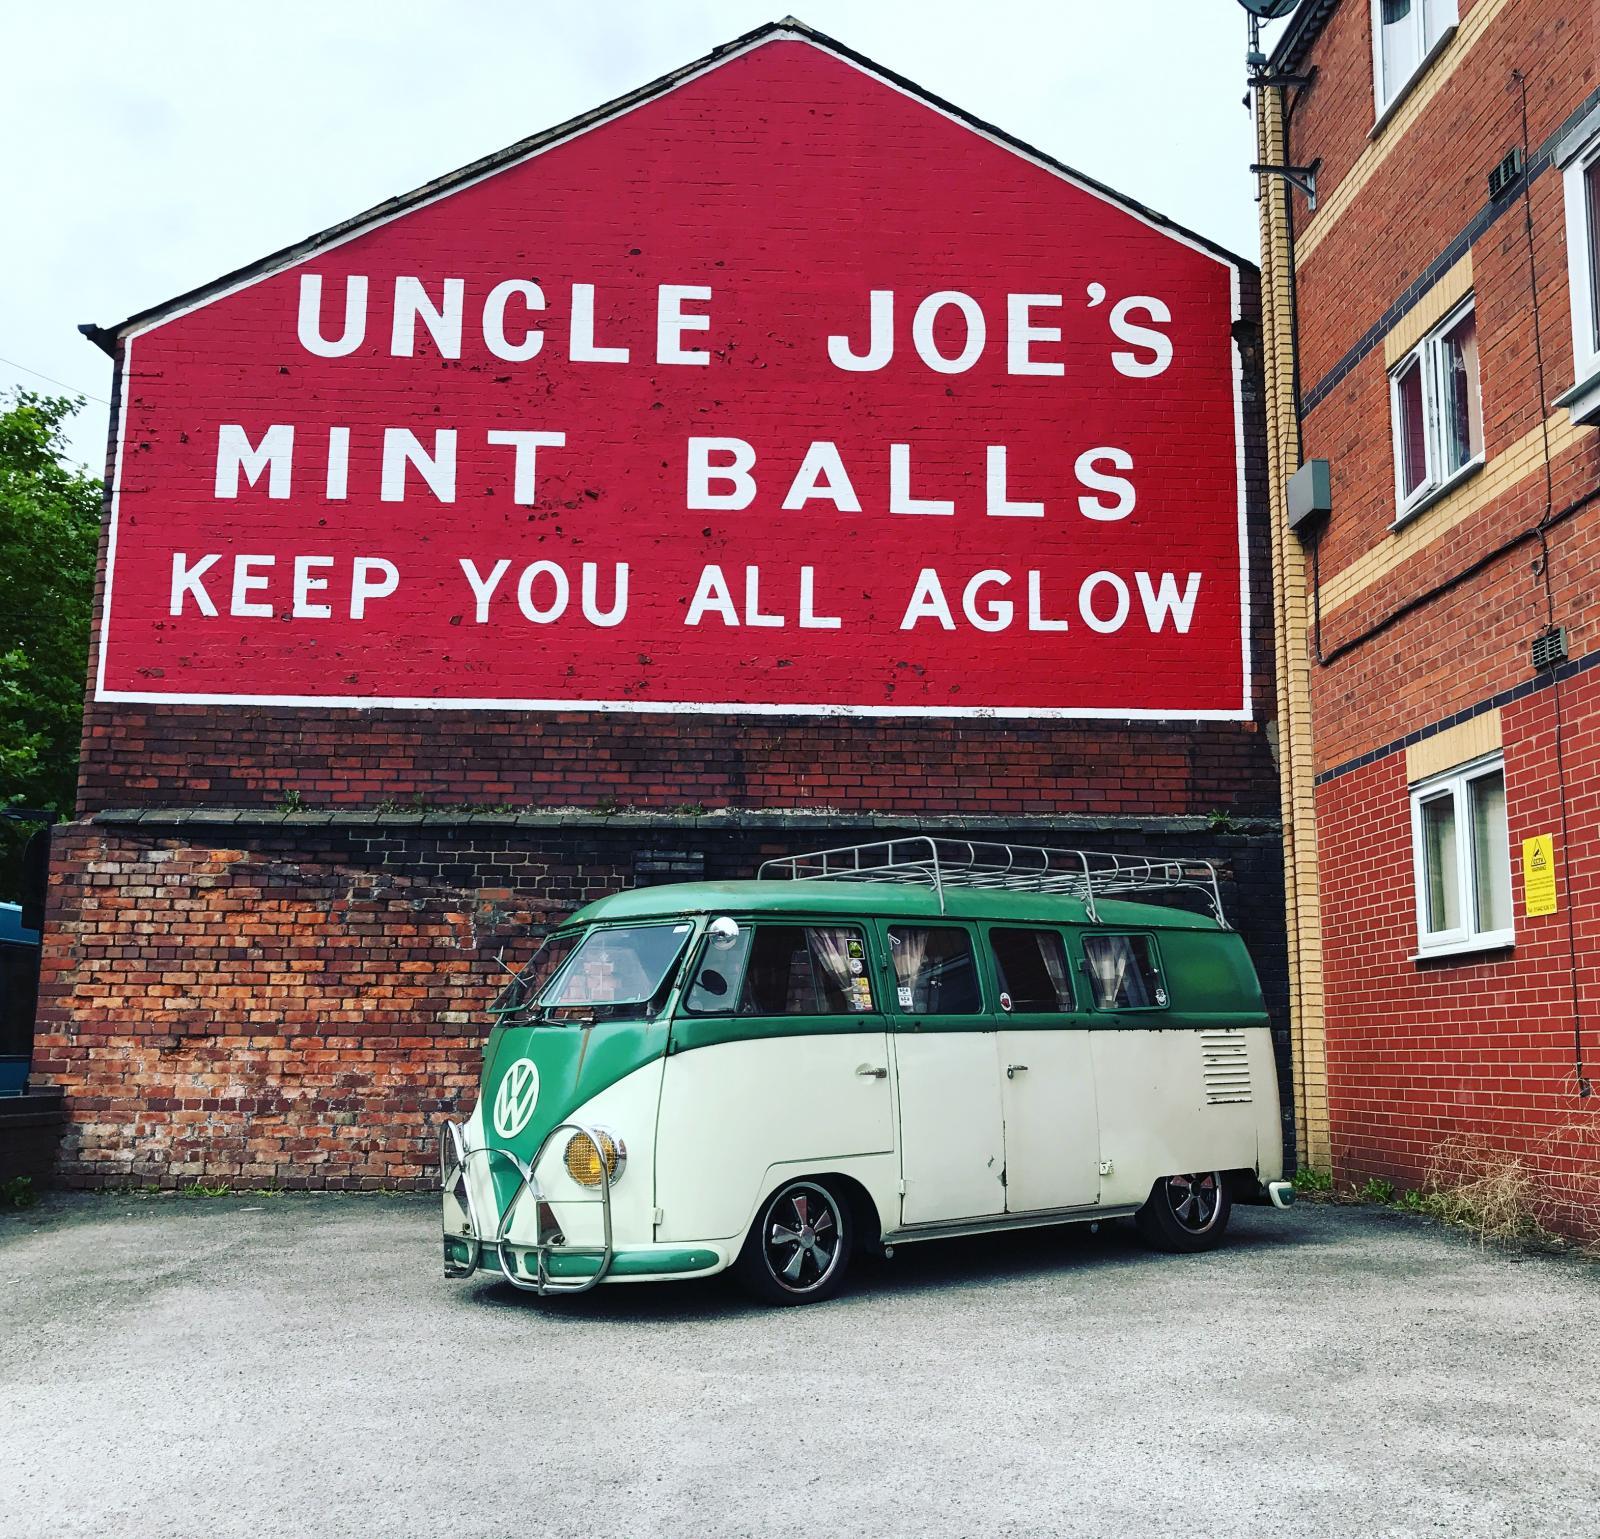 Uncle Joe's / Barndoor Buses keep you all aglow